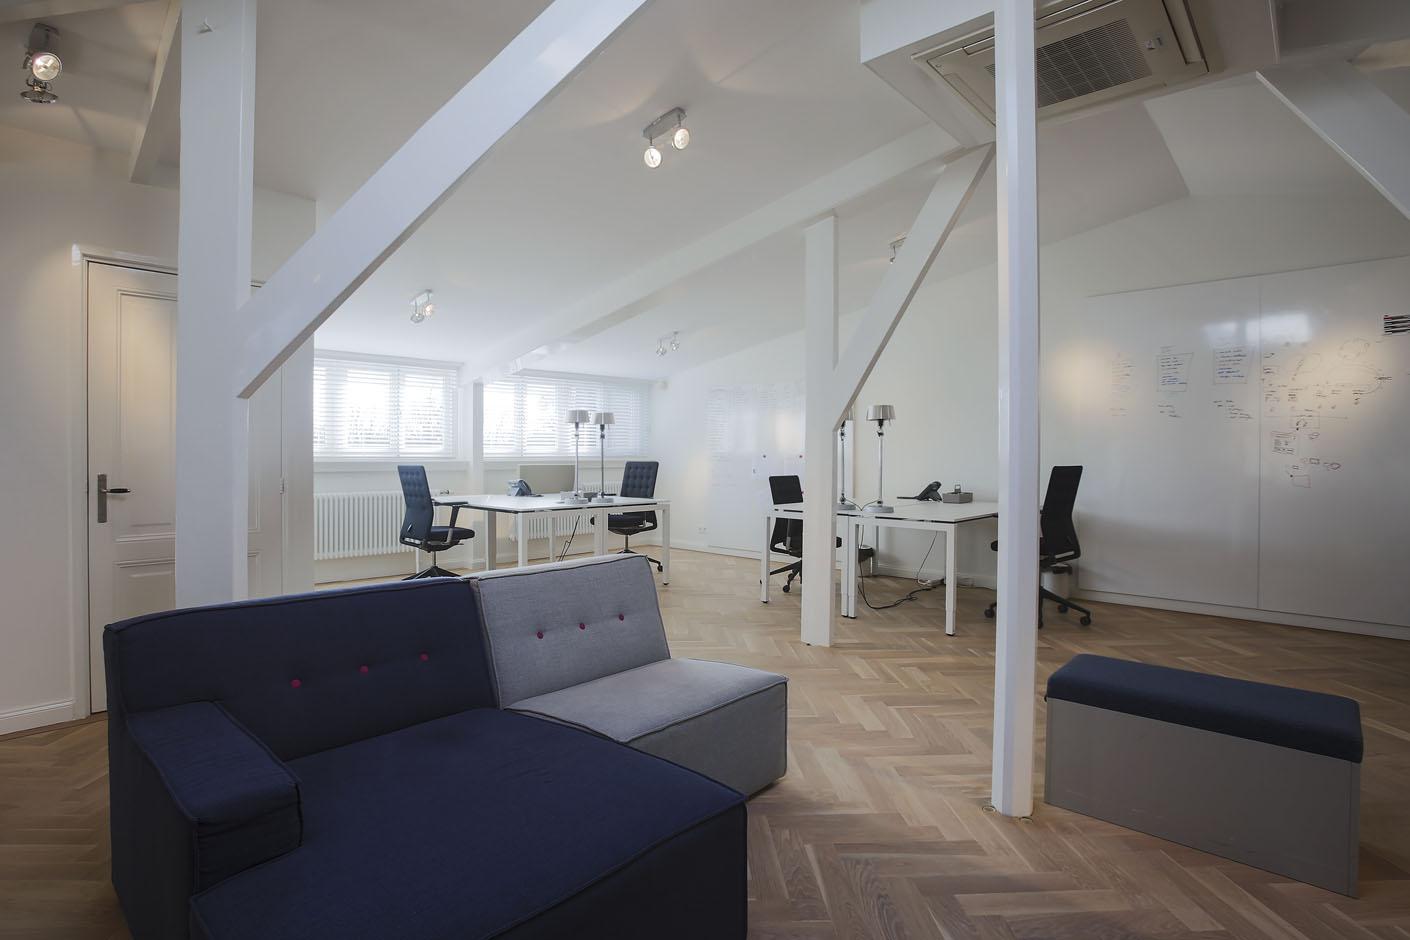 studio-hermanides-boutique-office-26.jpg